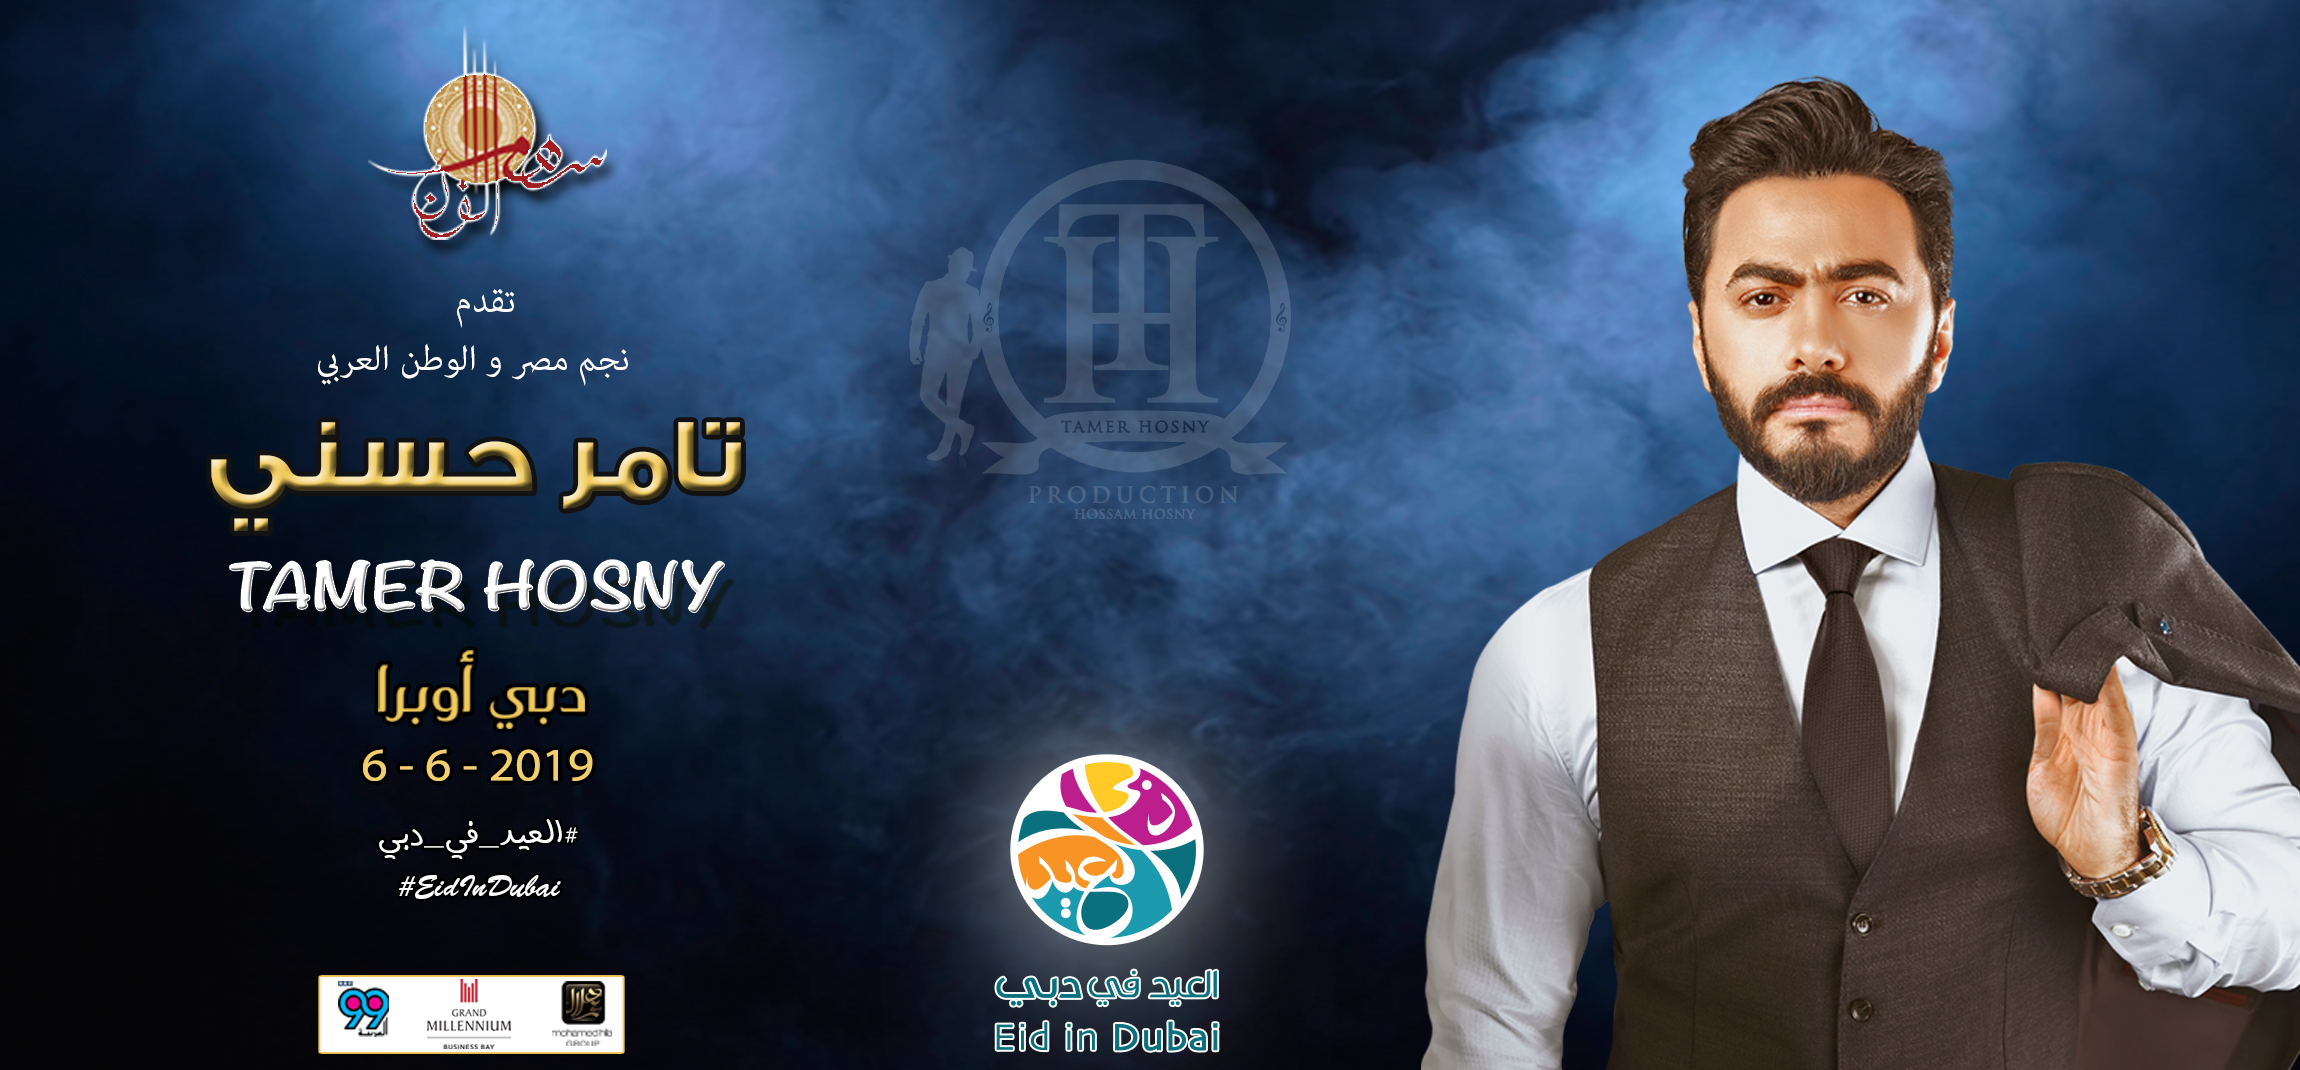 Tamer Hosny Live at Dubai Opera